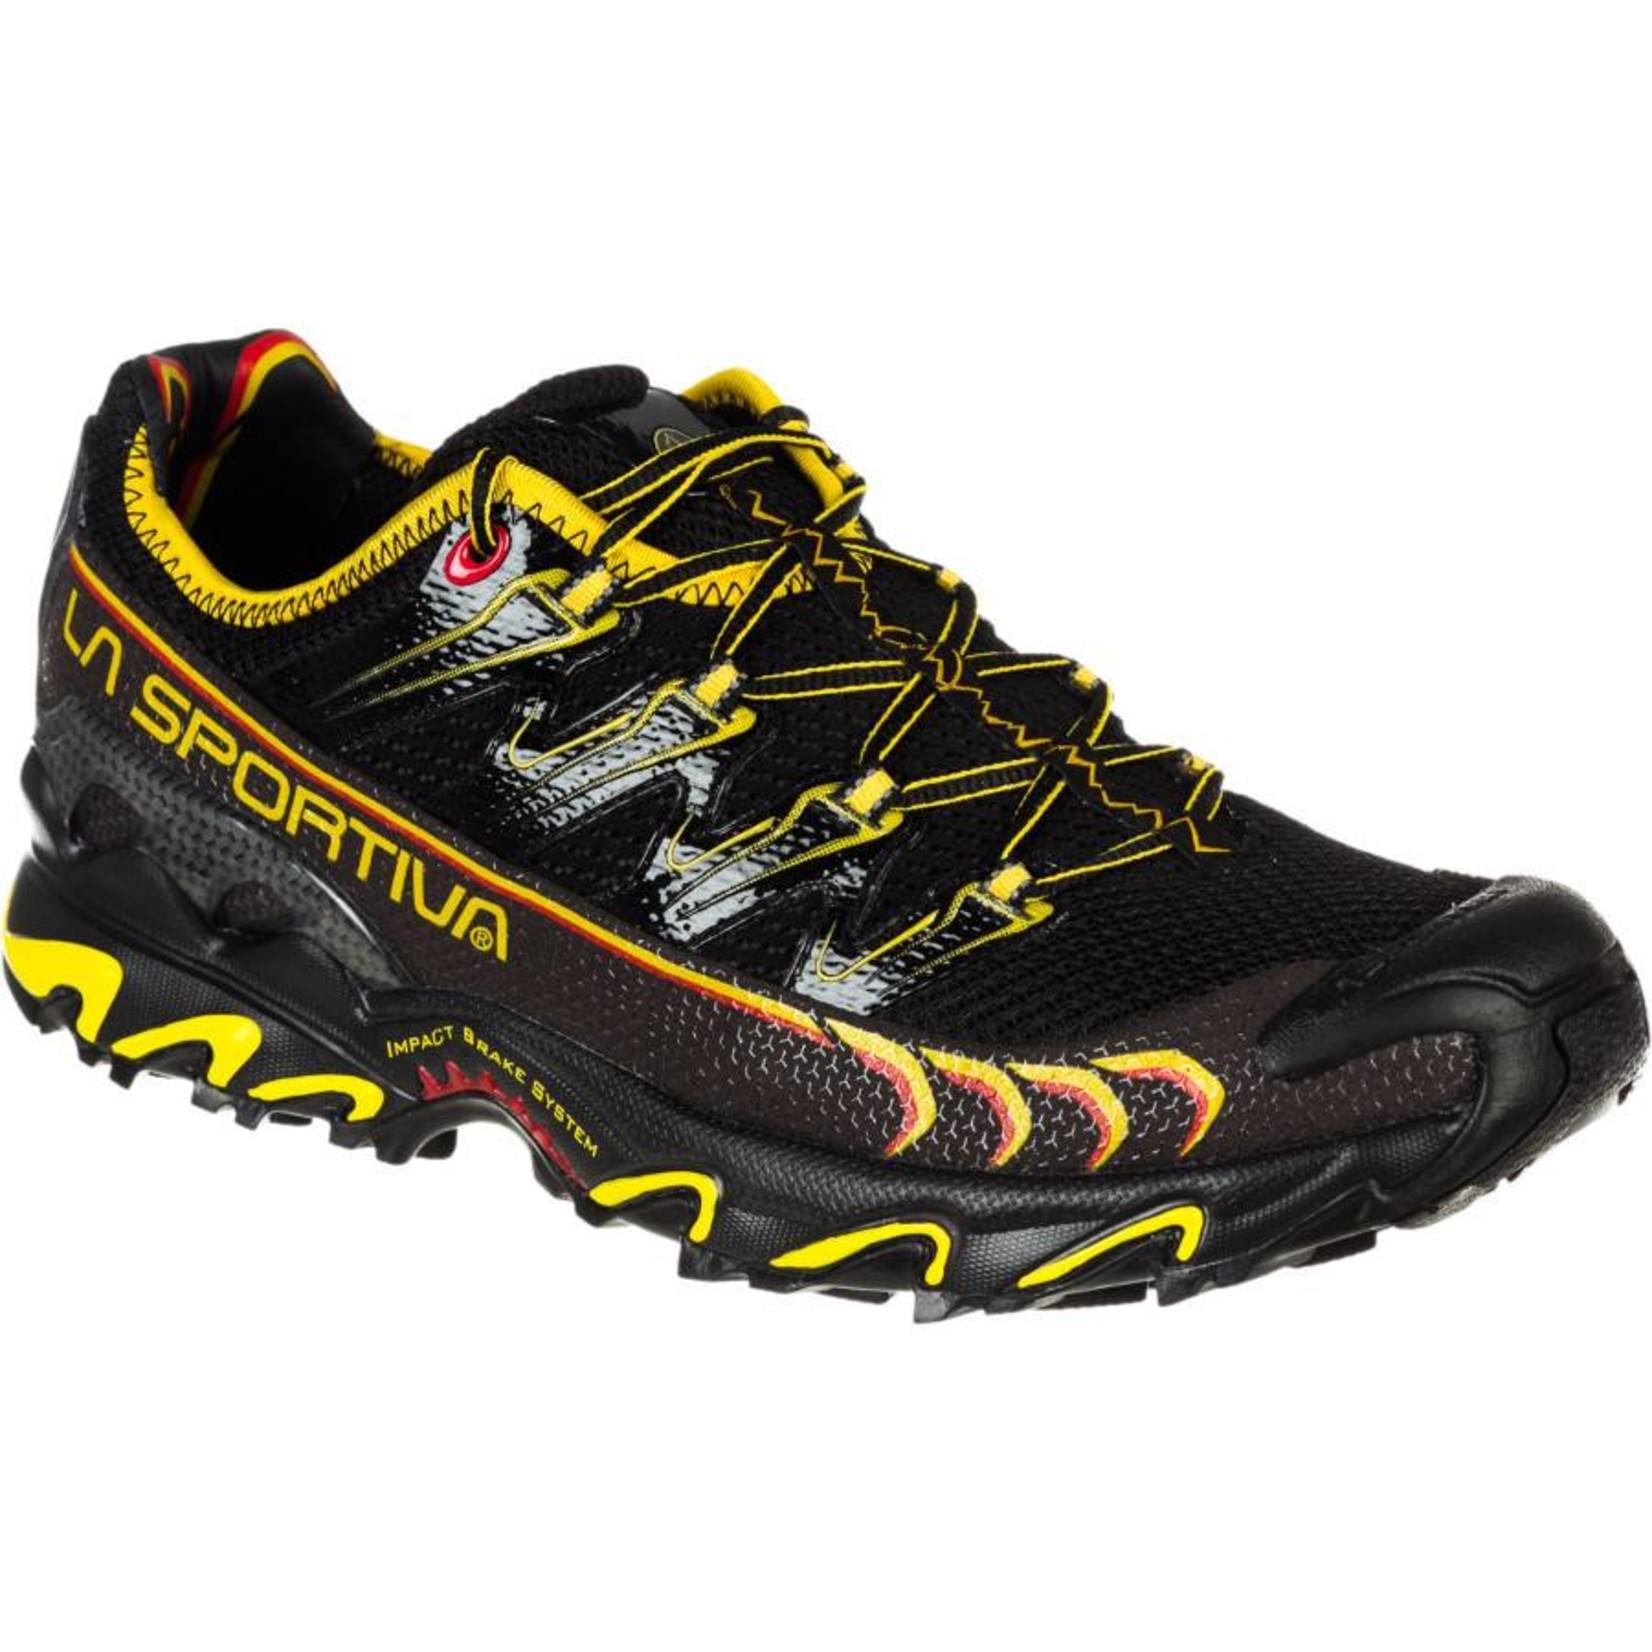 La Sportiva La Sportiva Ultra Raptor Running Shoes - Men